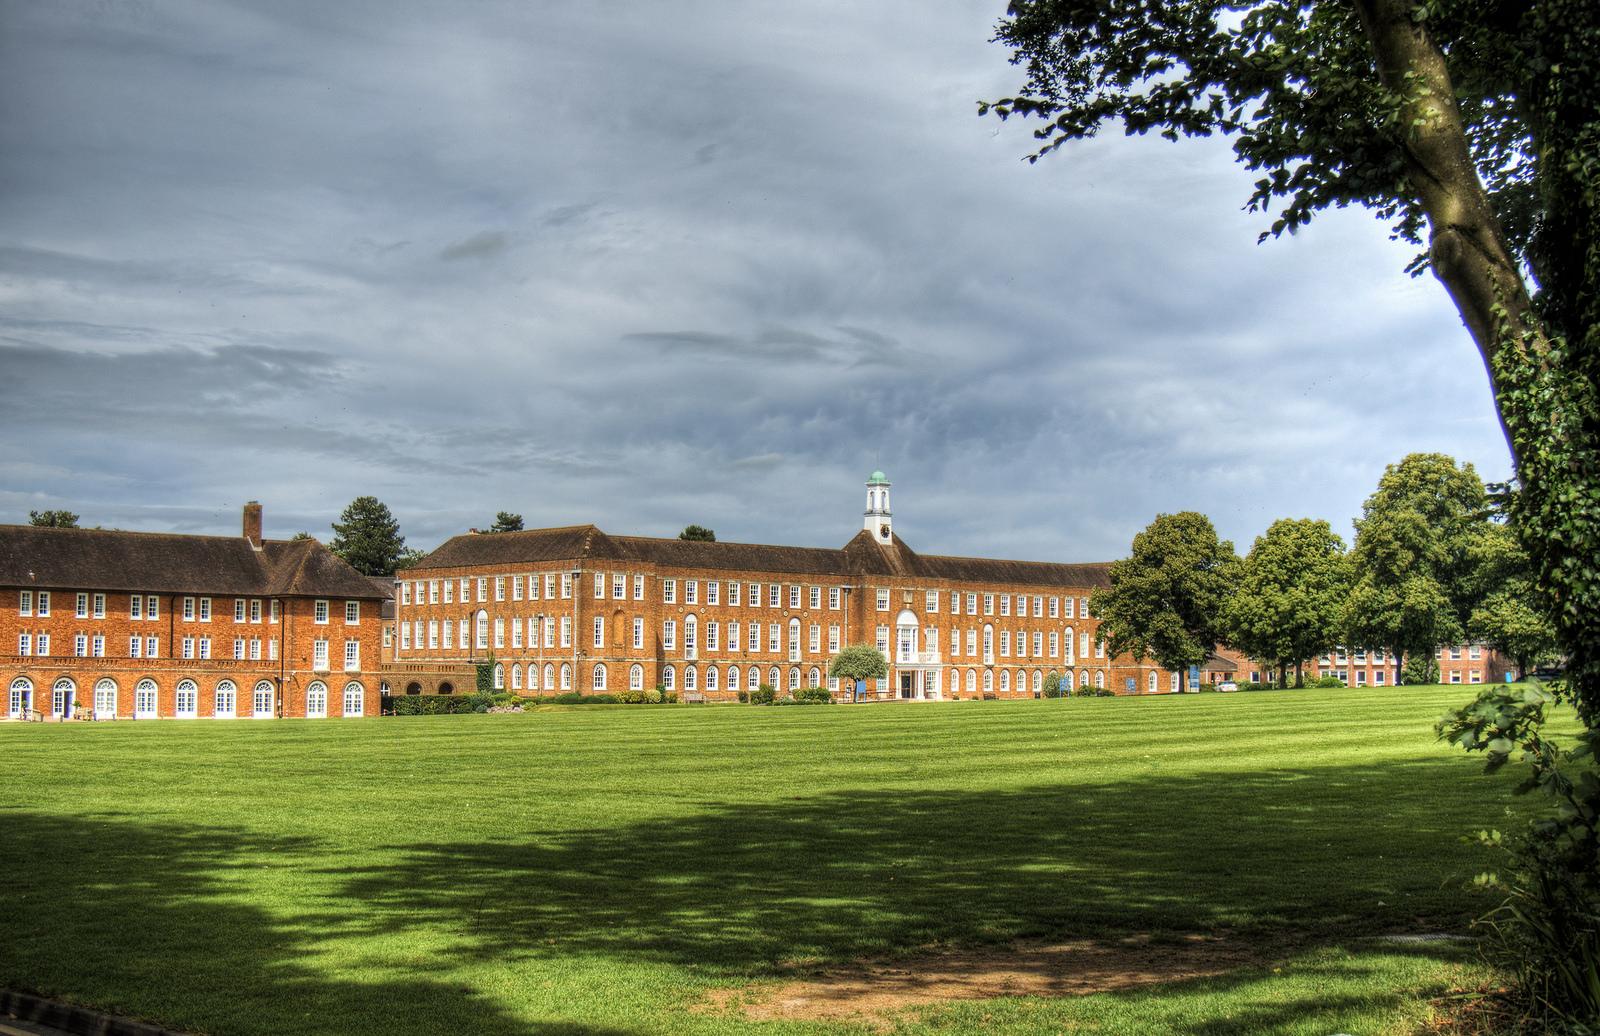 St Swithuns School